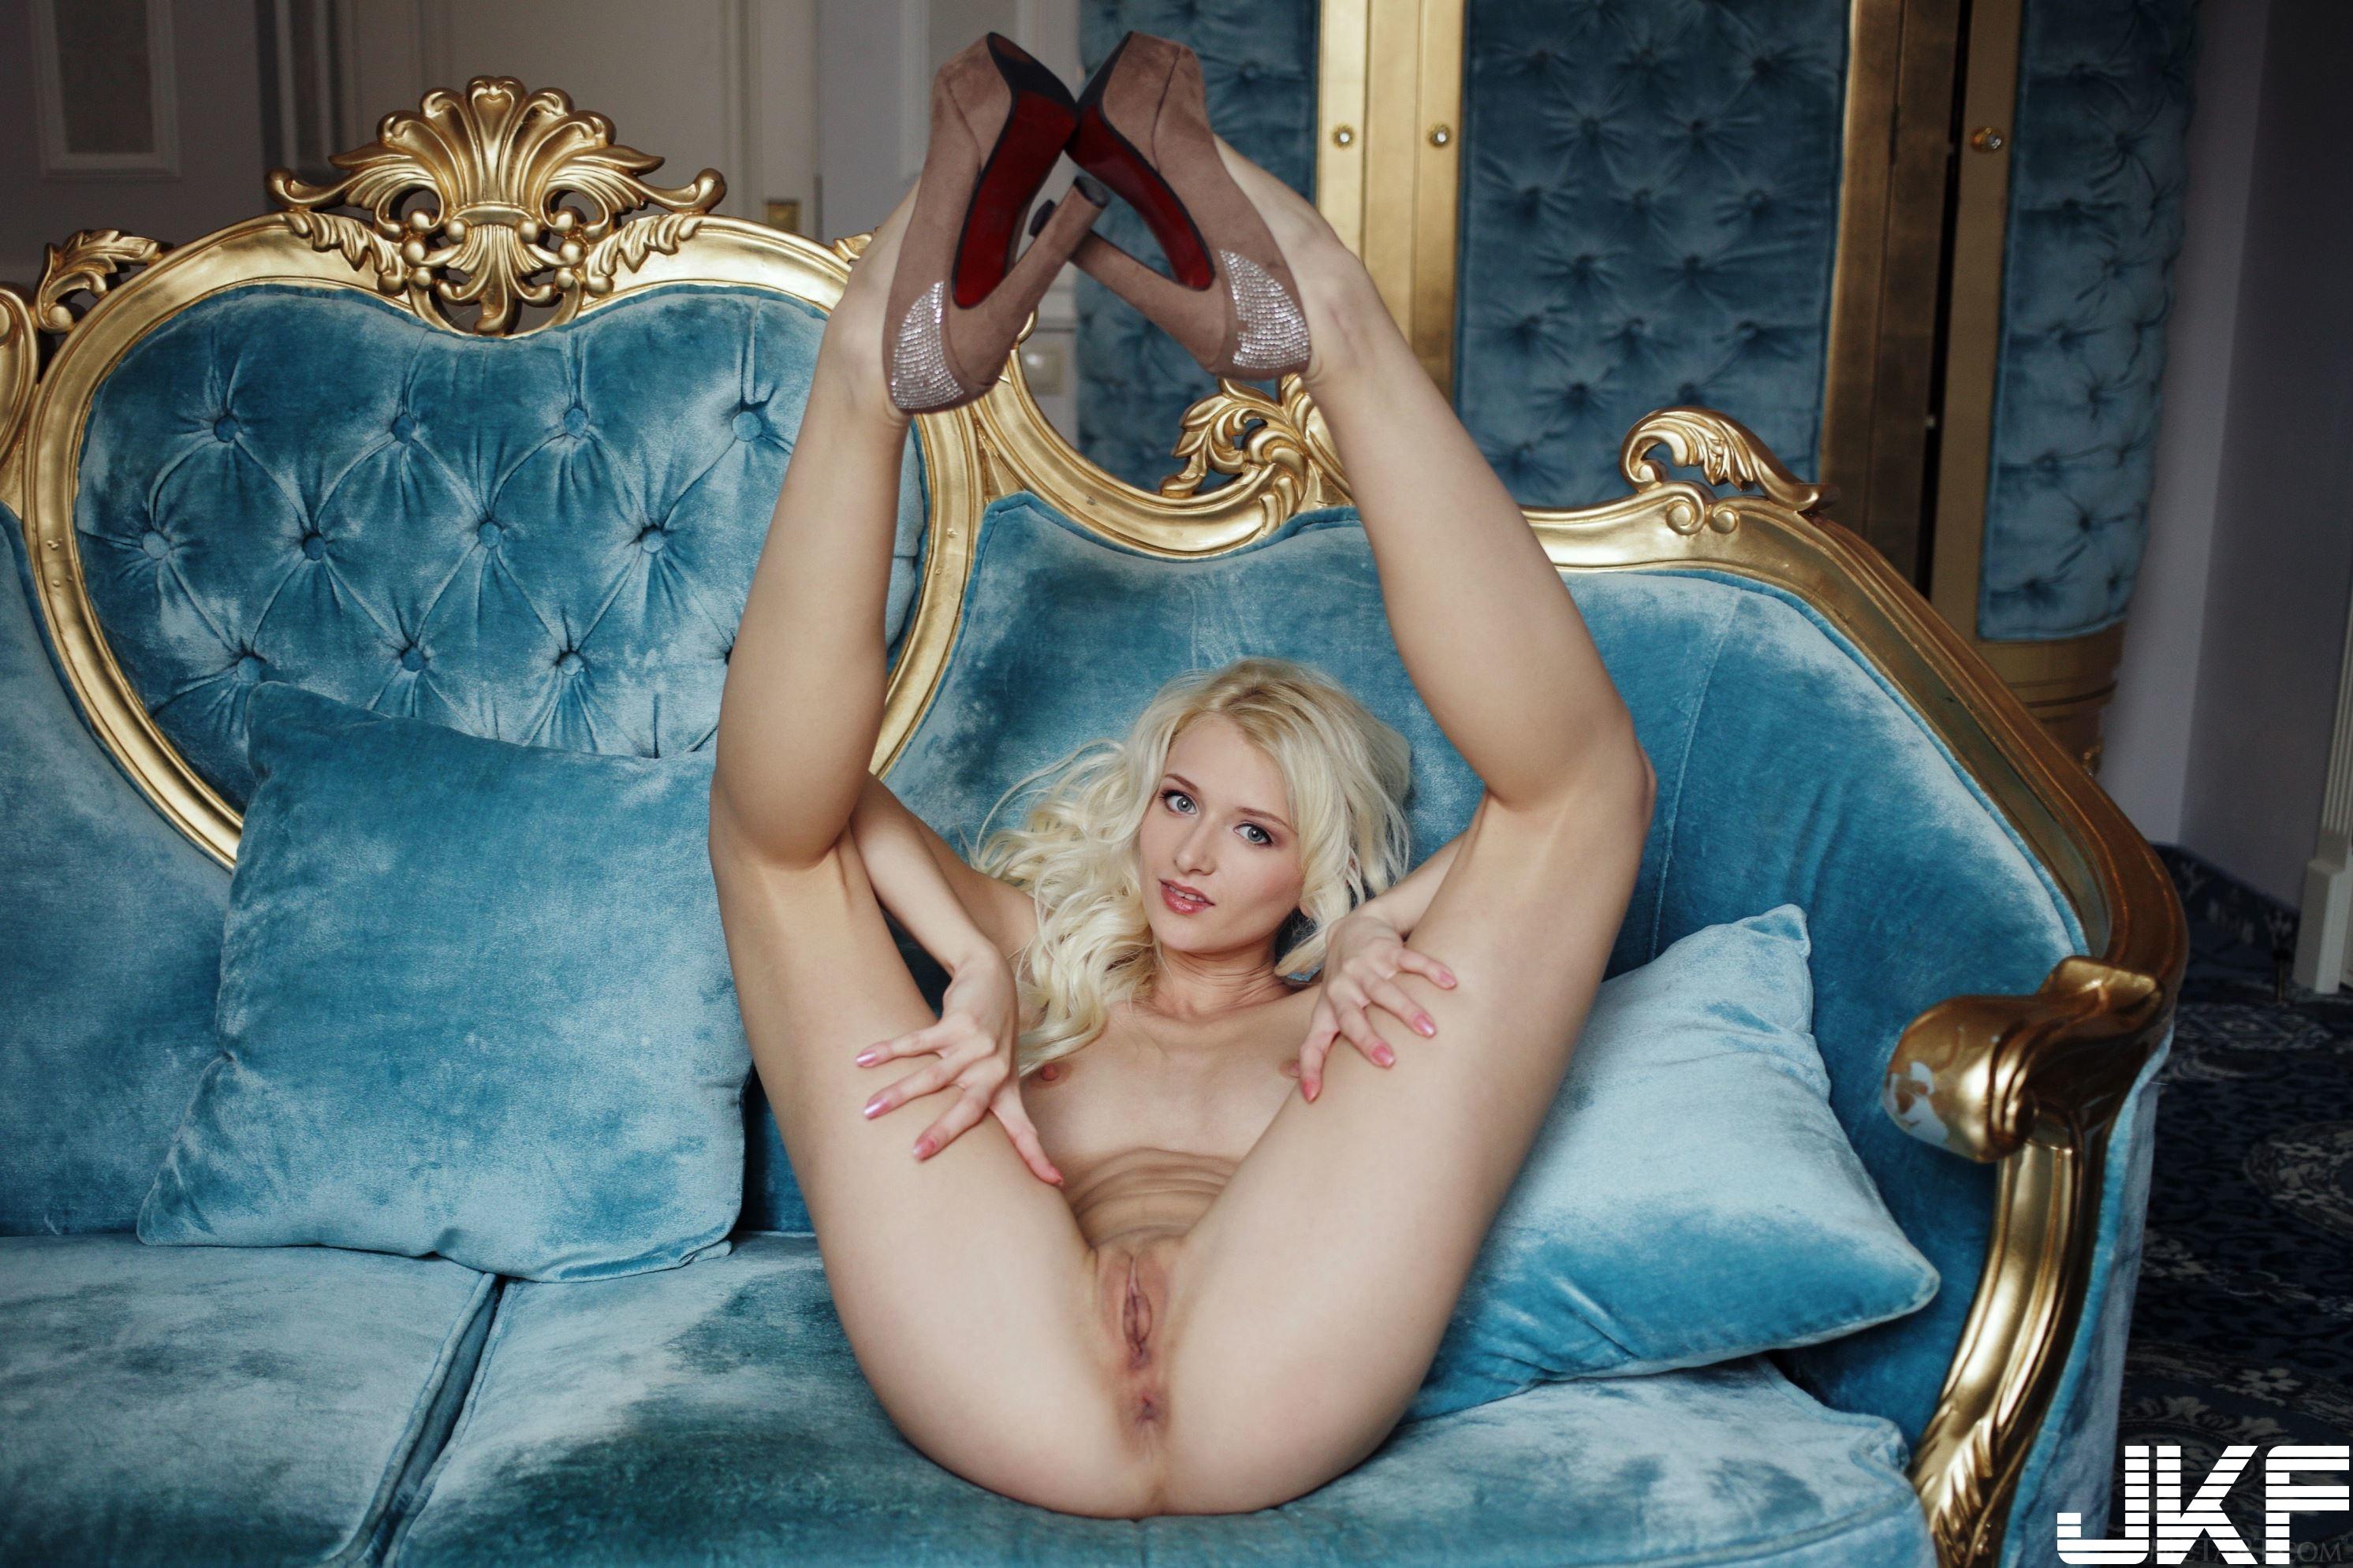 Shaved-Blonde-Adelia-B-with-Open-Pussy-Wearing-Platform-High-Heels-14.jpg